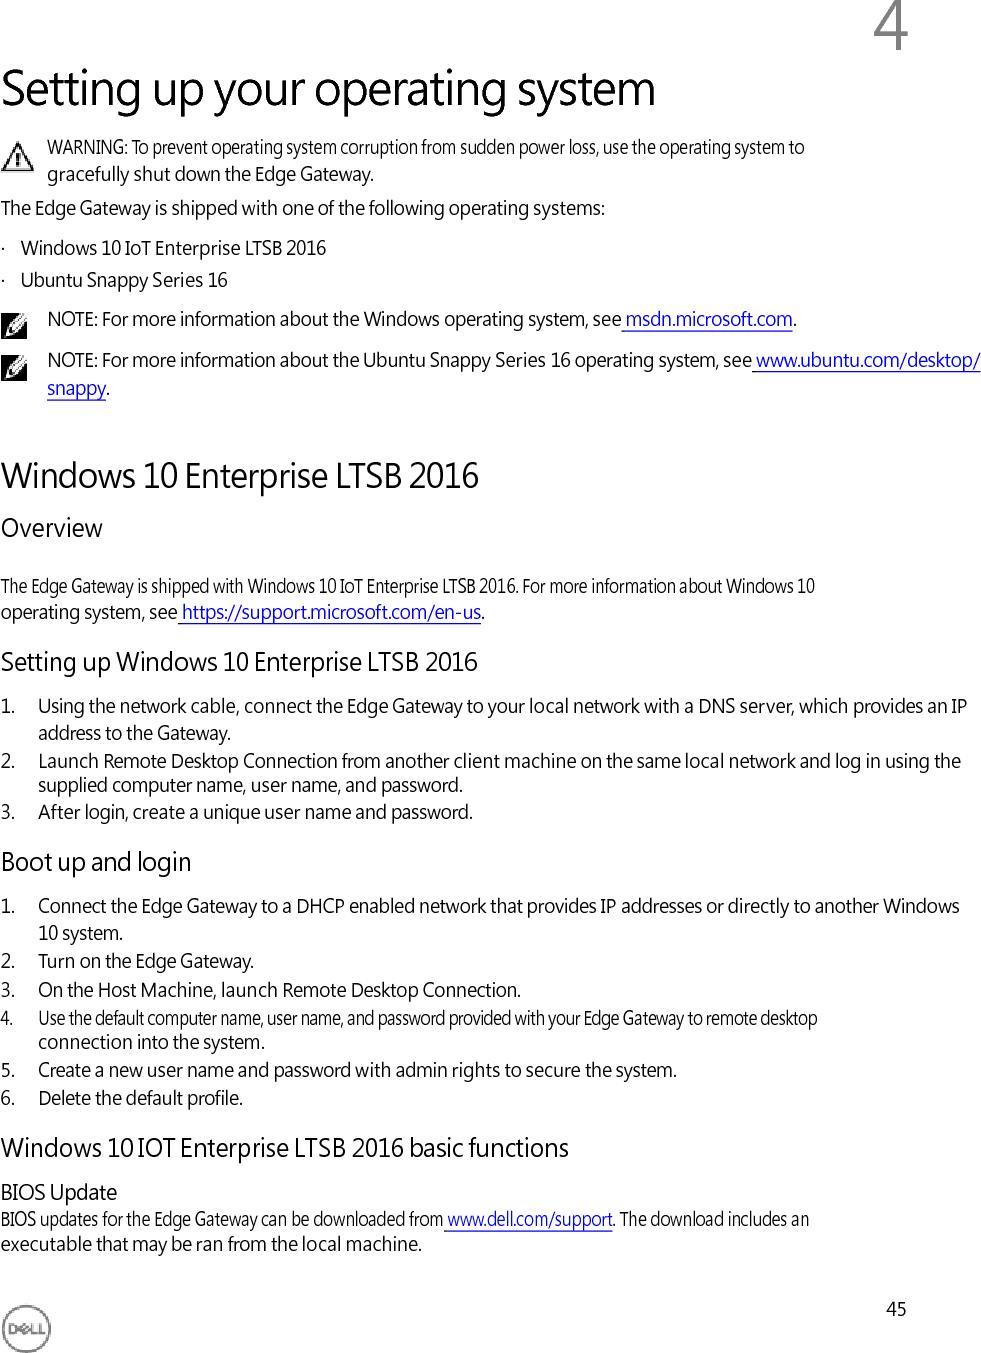 Dell N03G001 Internet of Things Gateway User Manual